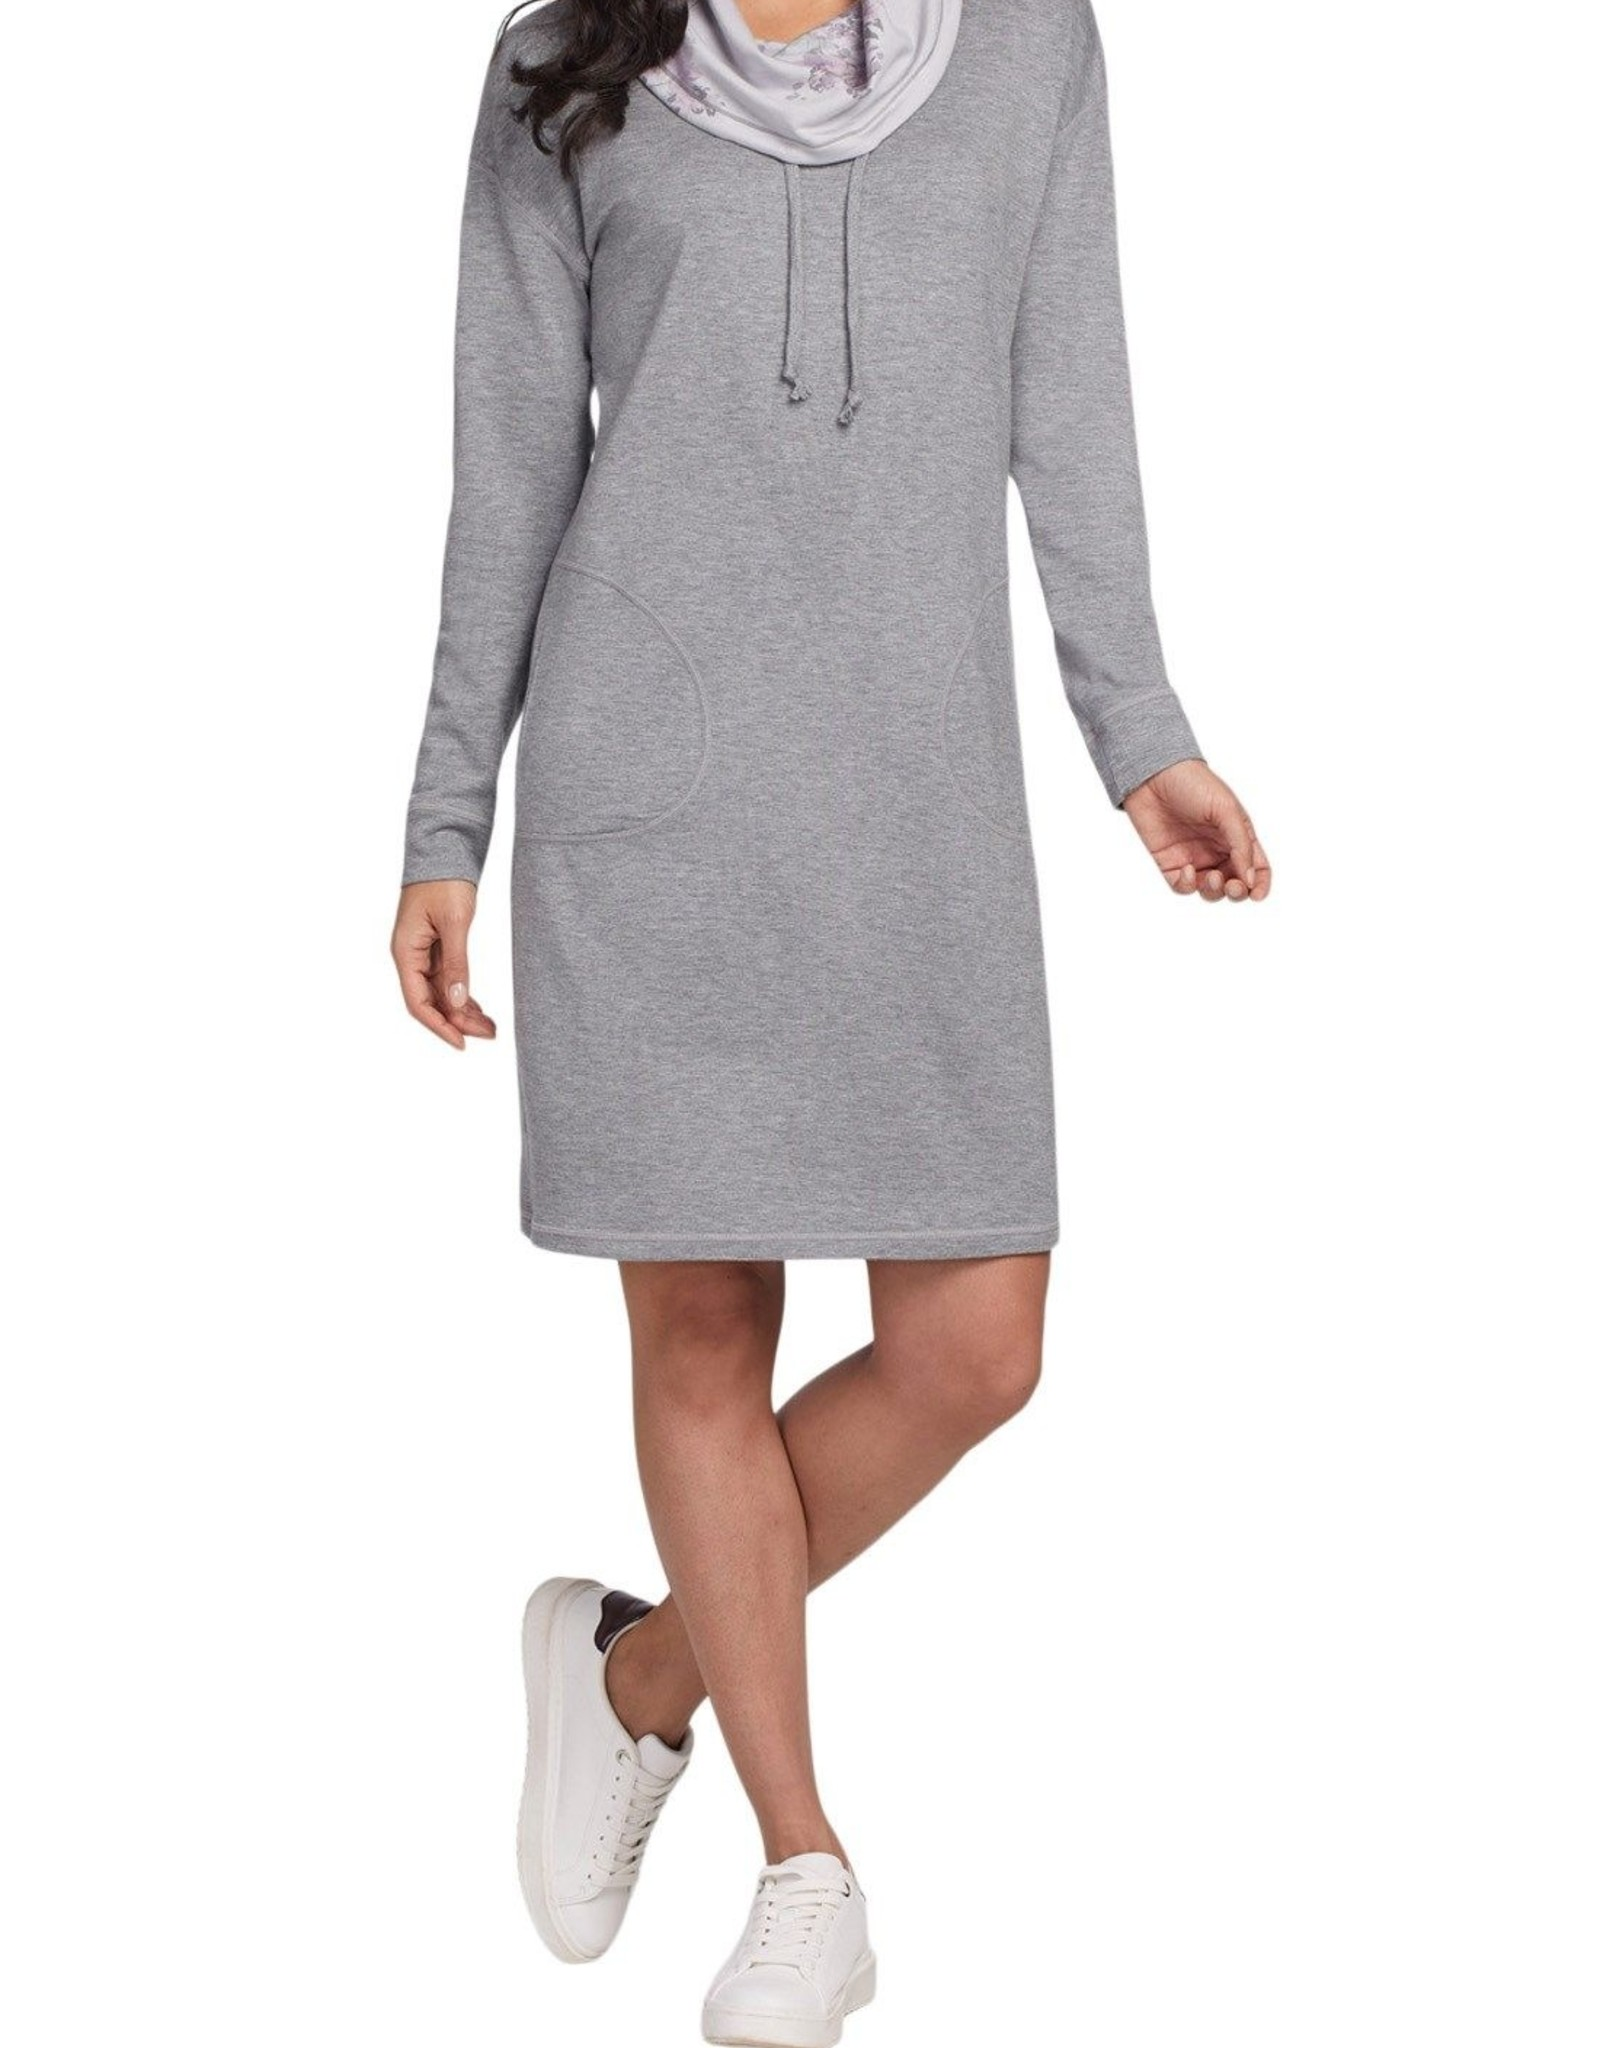 Tribal Tribal, Reversible Cowl Neck Dress, 7123O